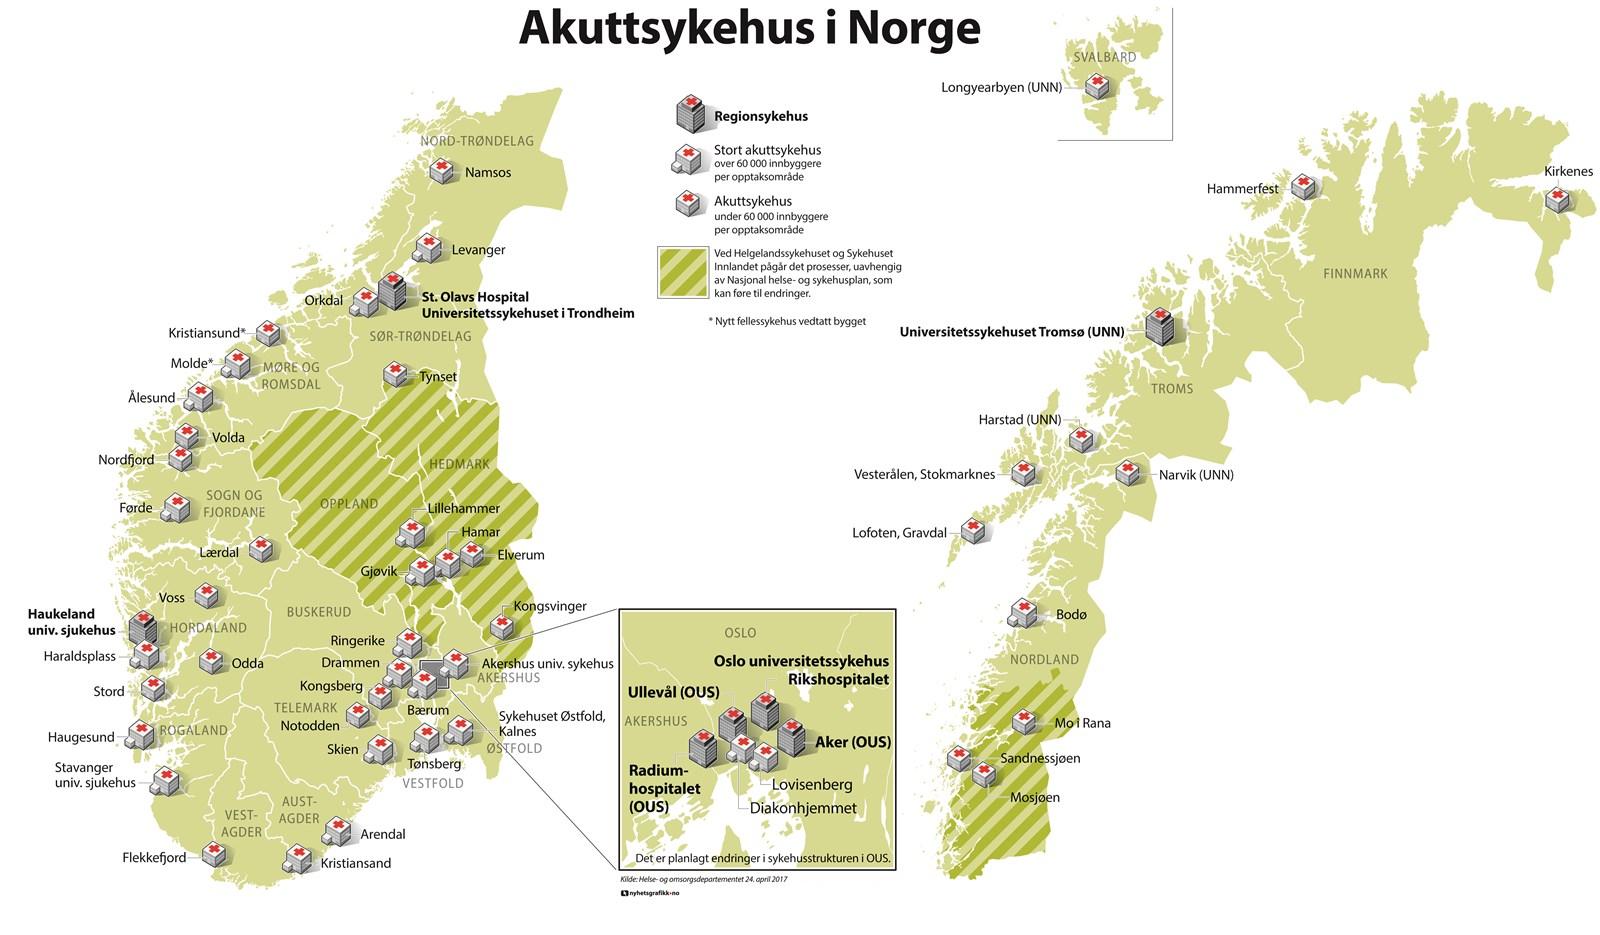 oppdatert kart over norge Kart over Norges akuttsykehus   regjeringen.no oppdatert kart over norge